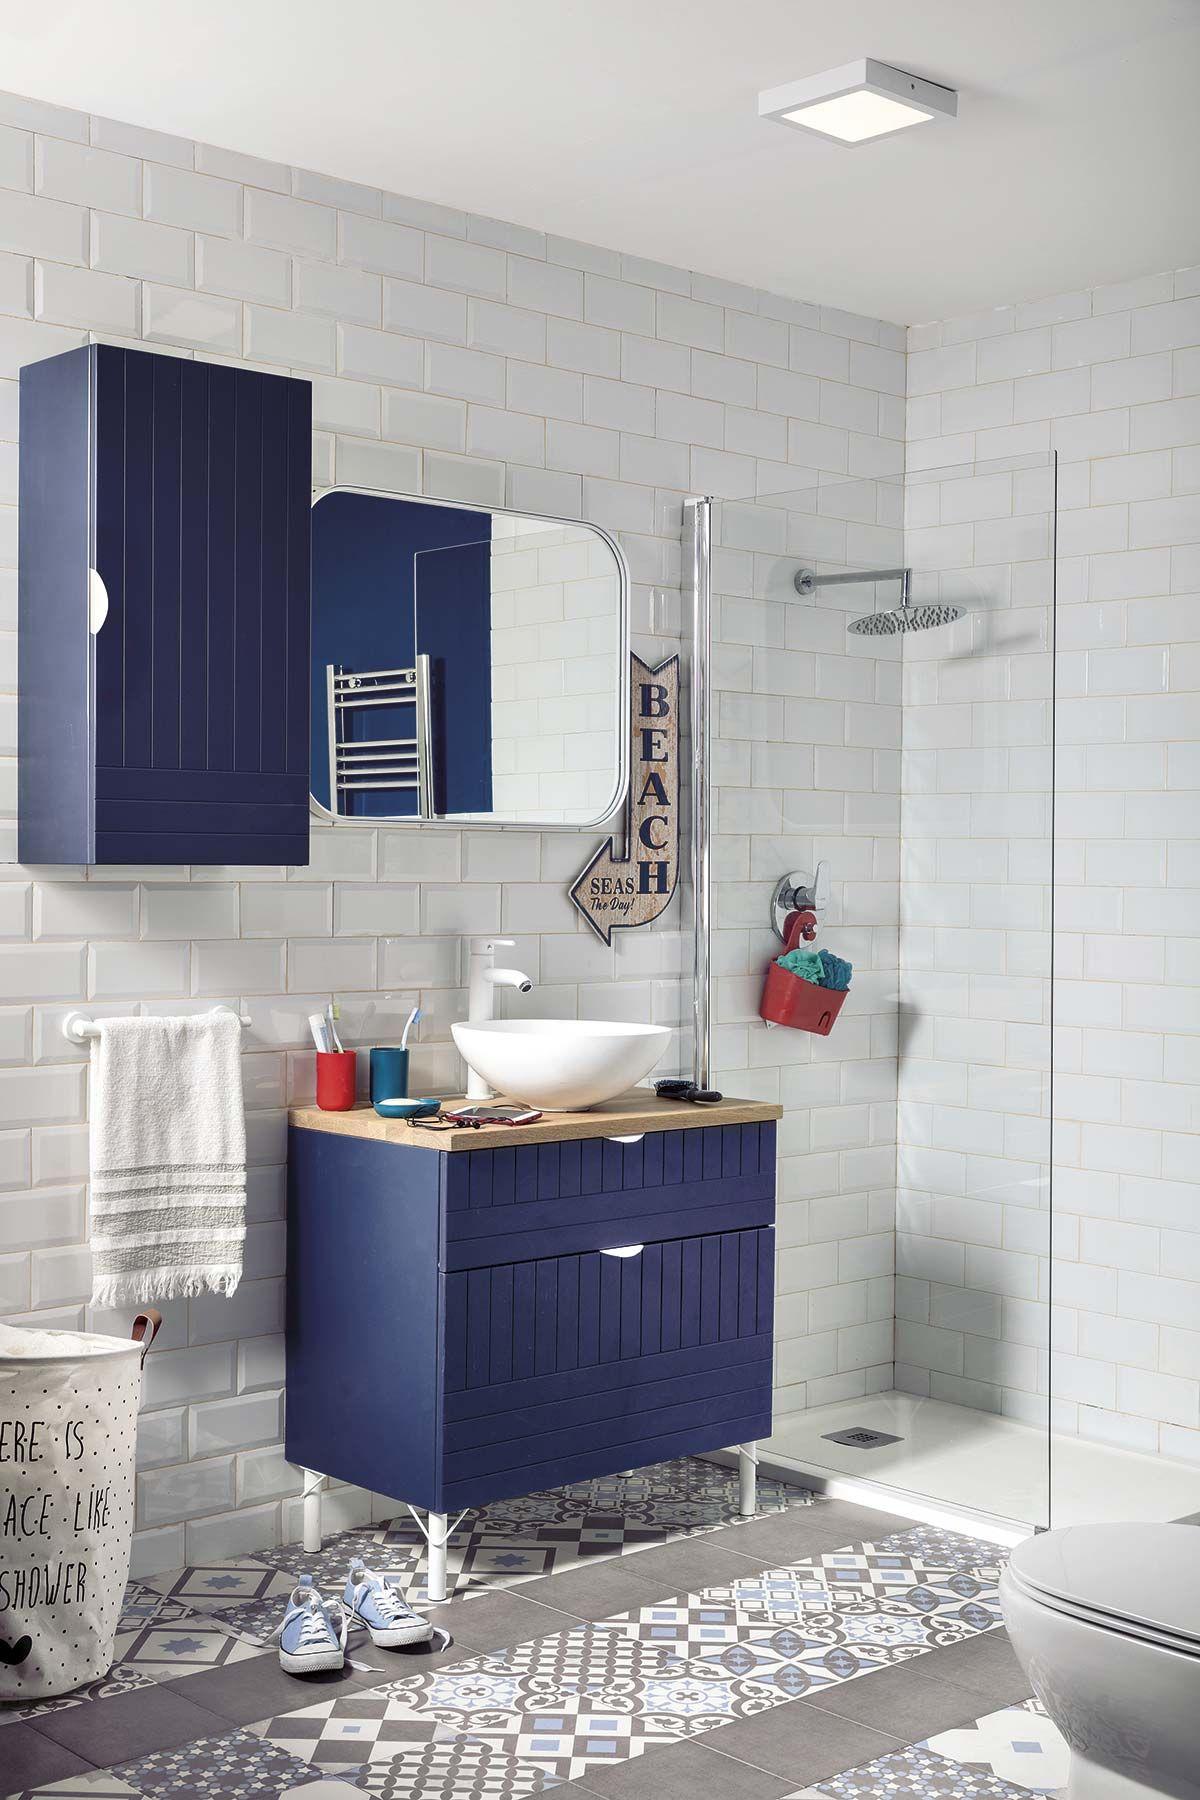 mueble classic blue